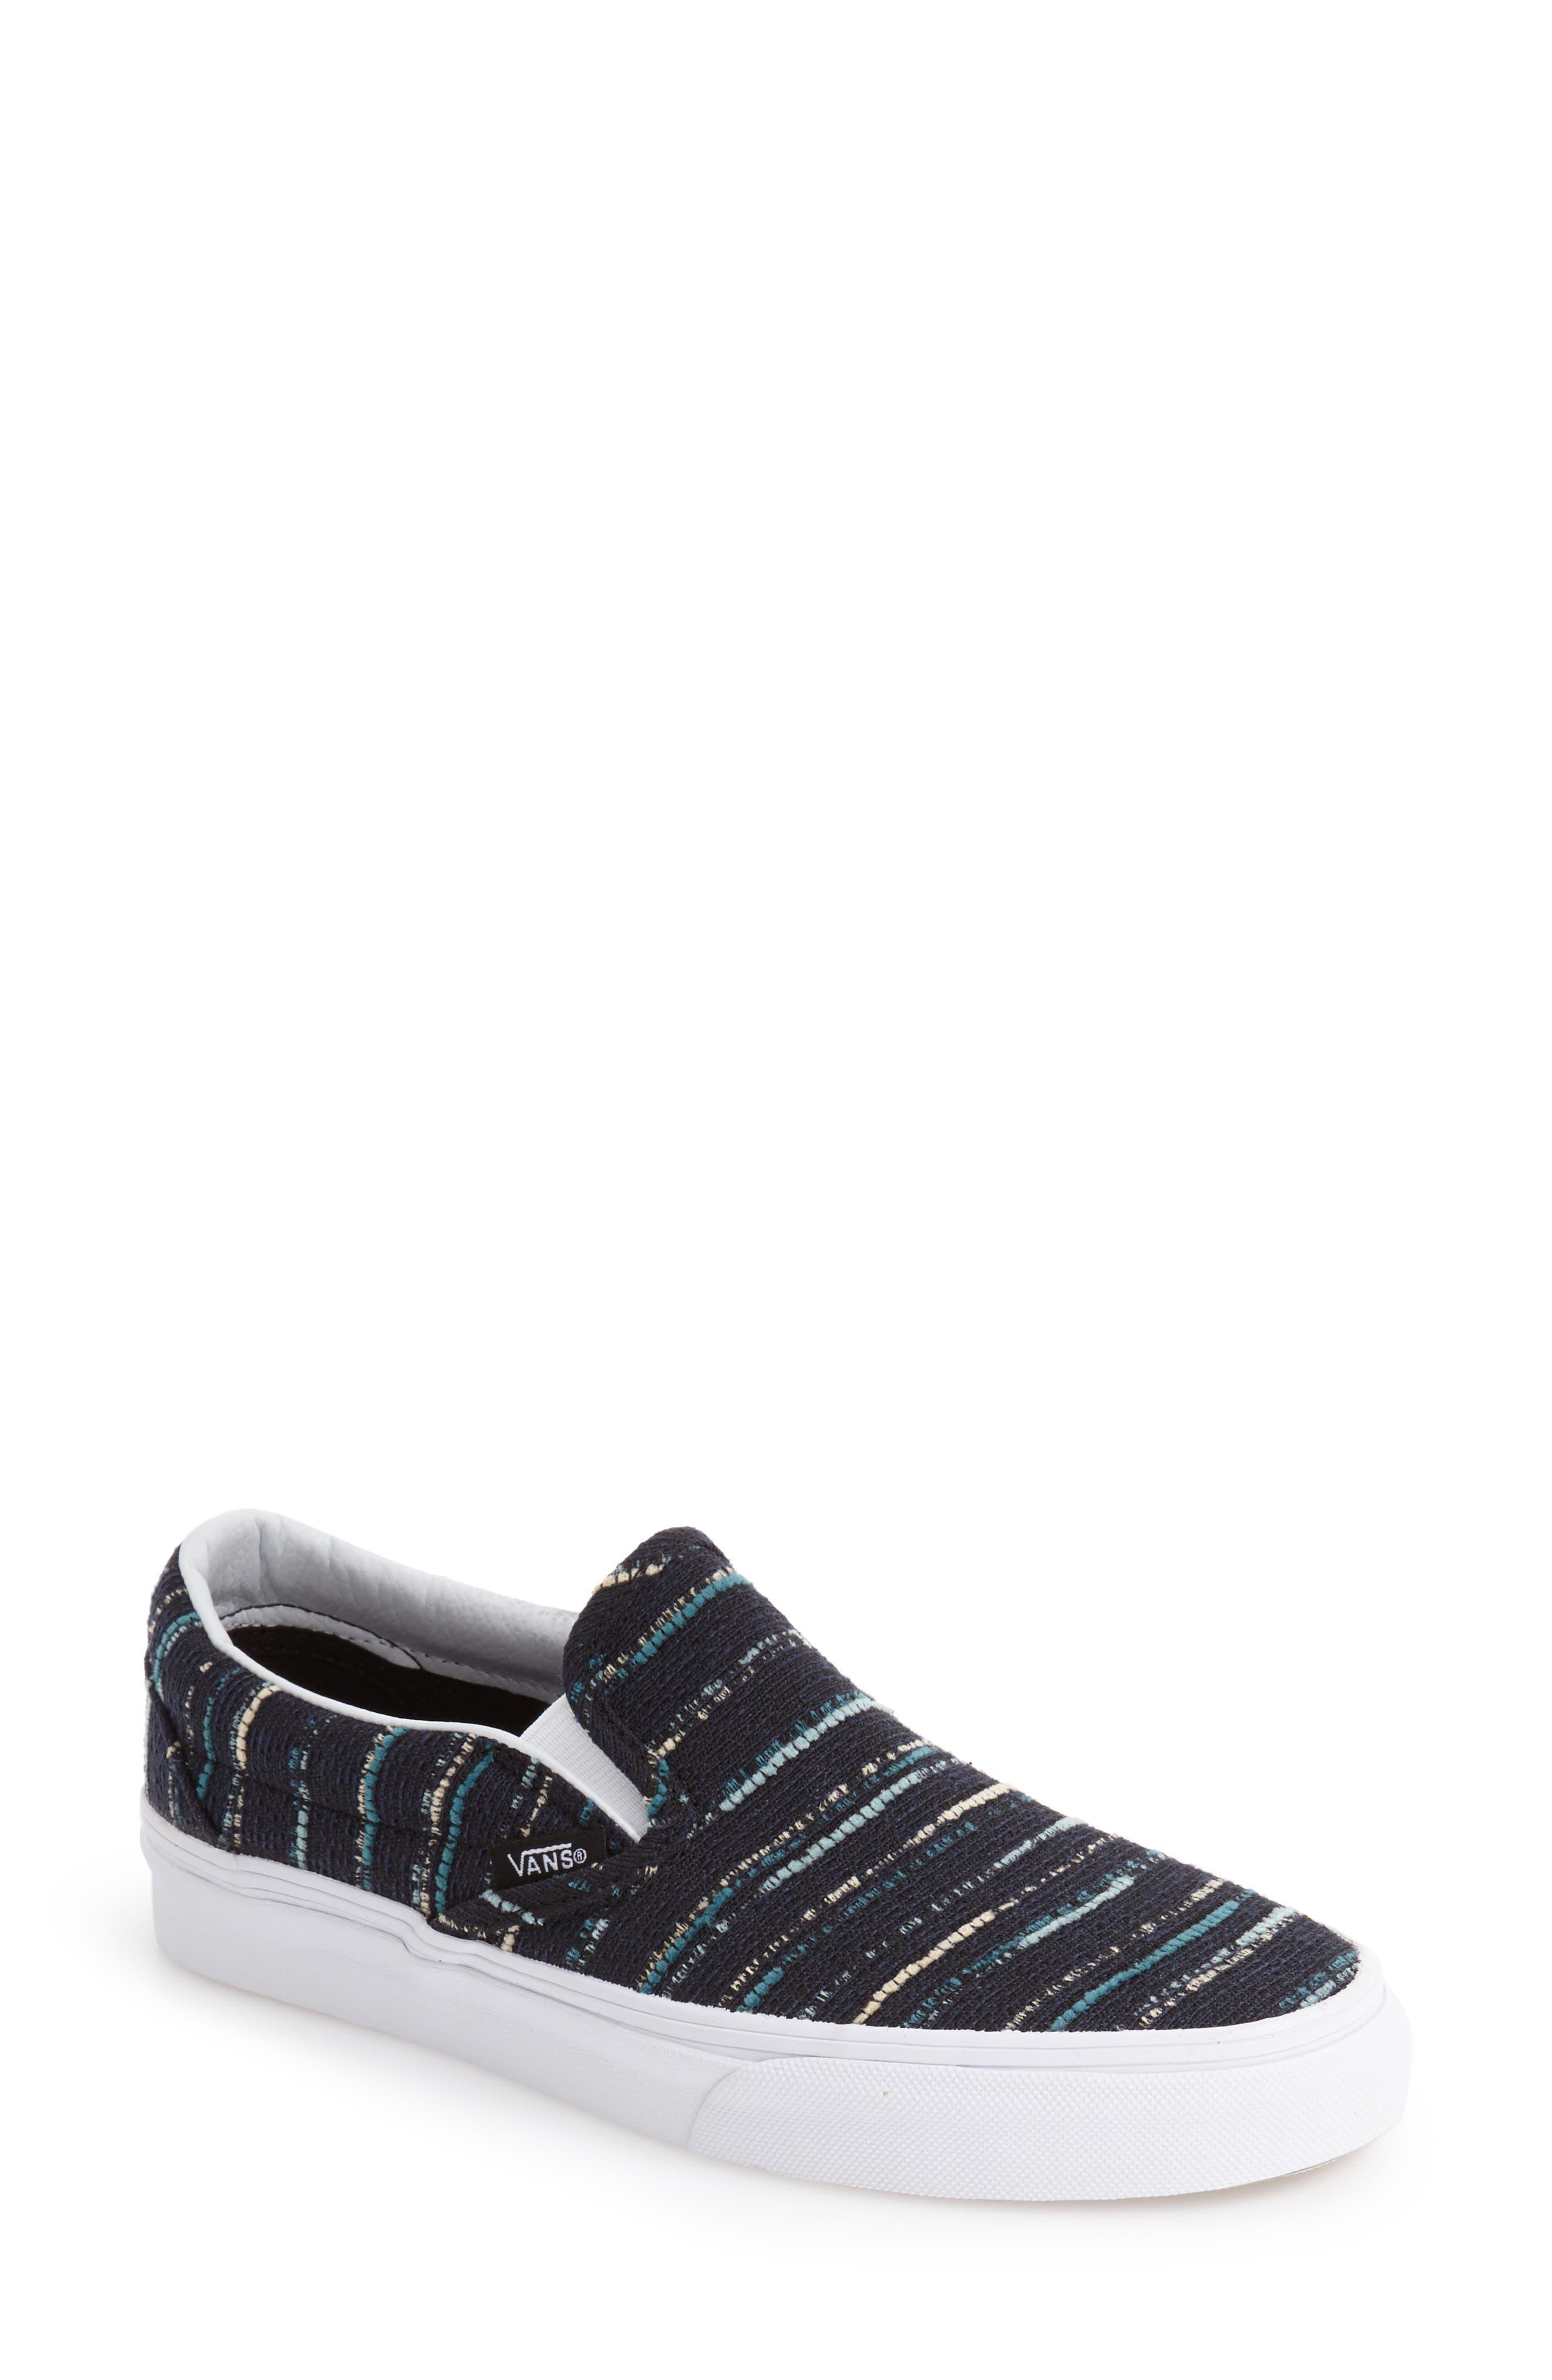 ,                             Classic Slip-On Sneaker,                             Main thumbnail 71, color,                             007